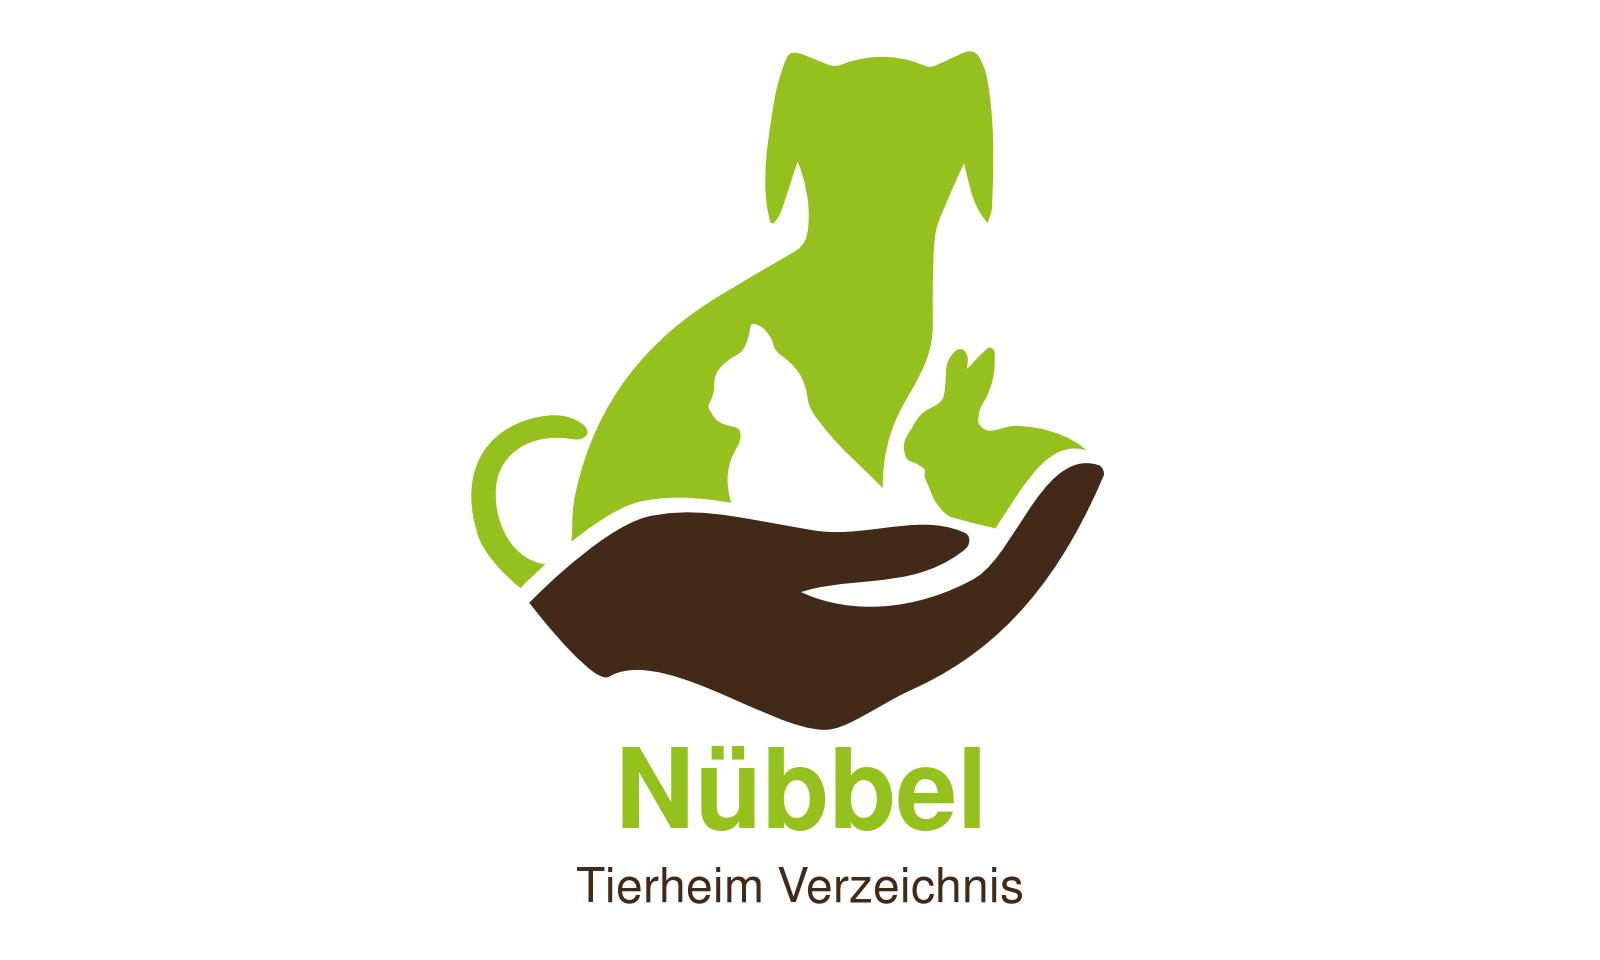 Tierheim Nübbel